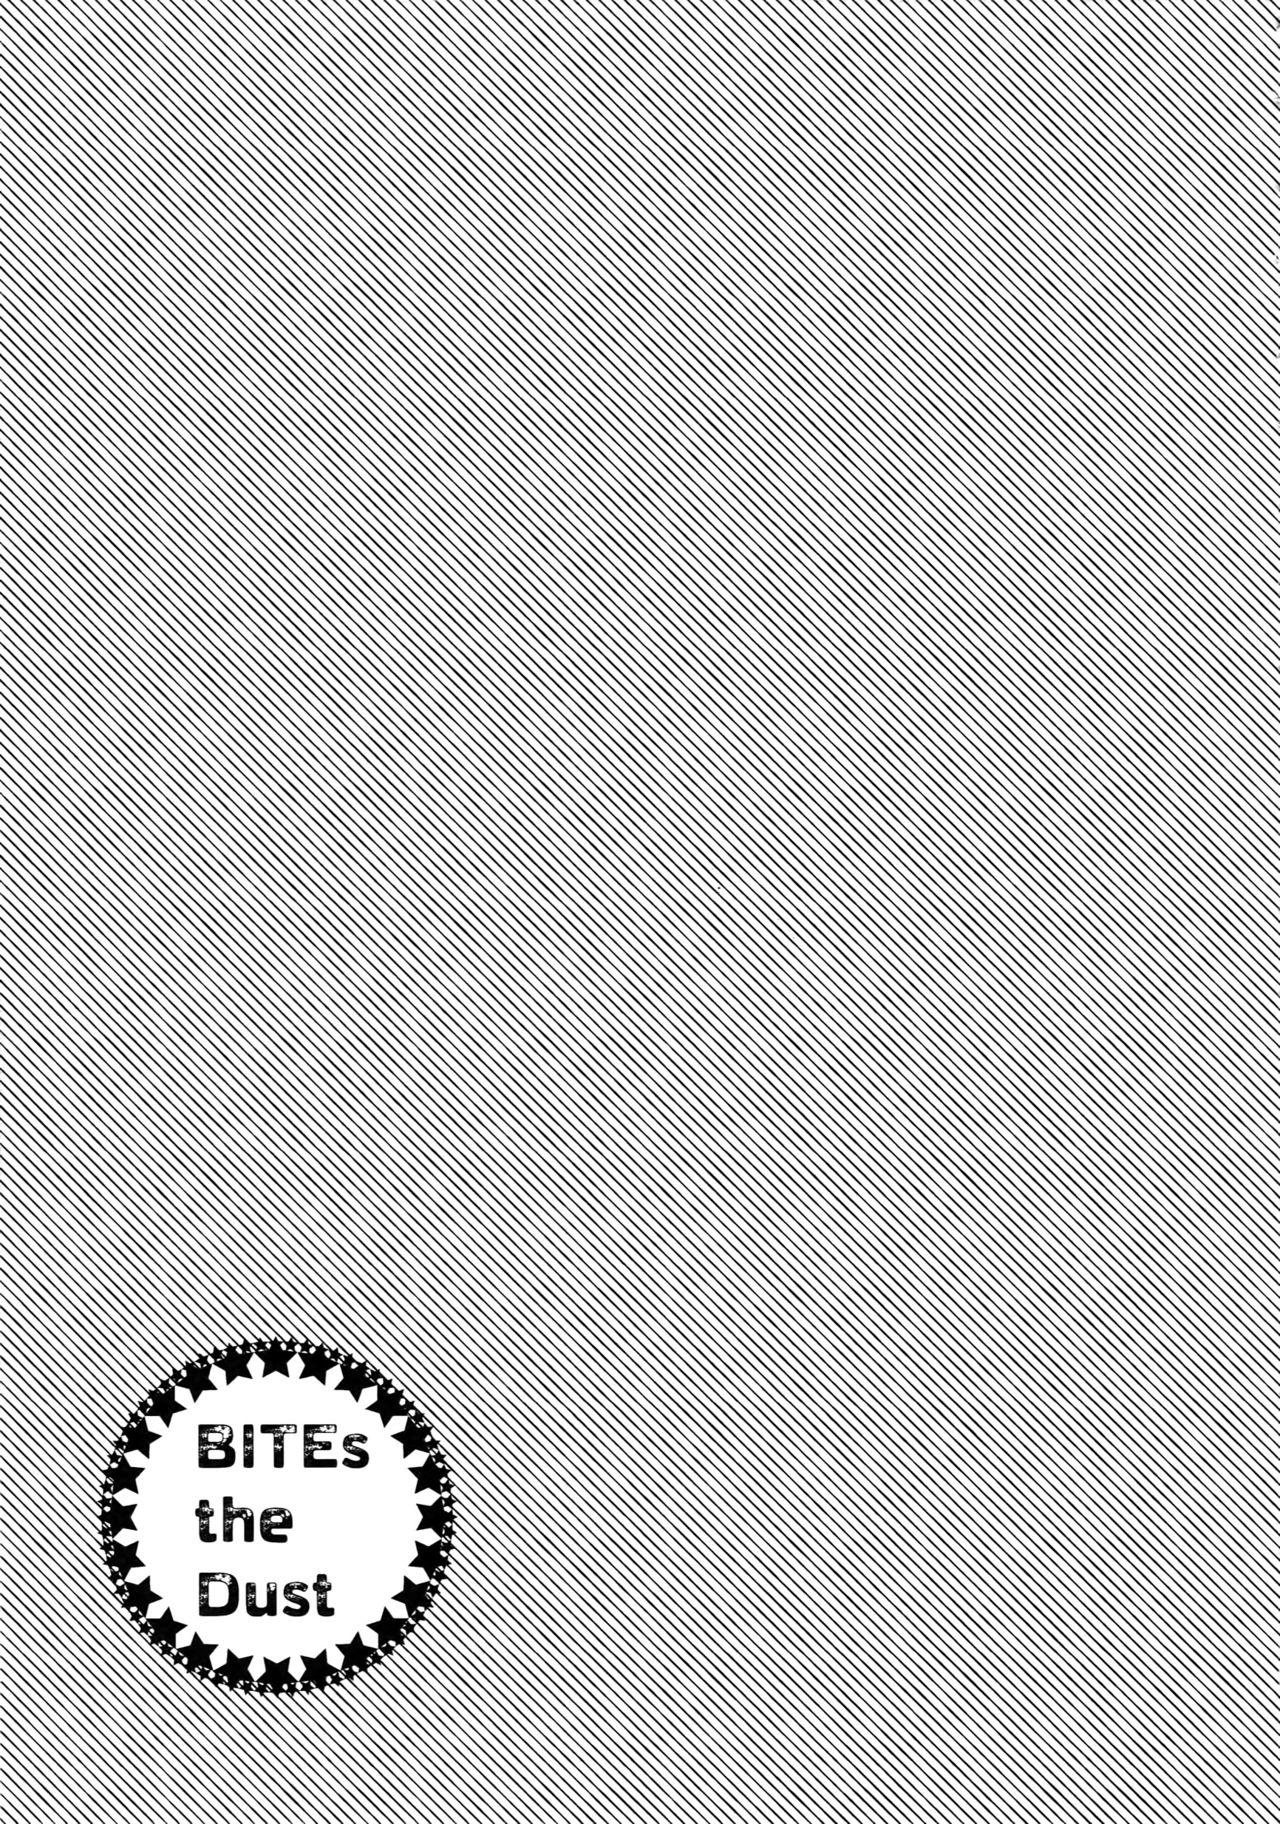 BITEs the Dust 184